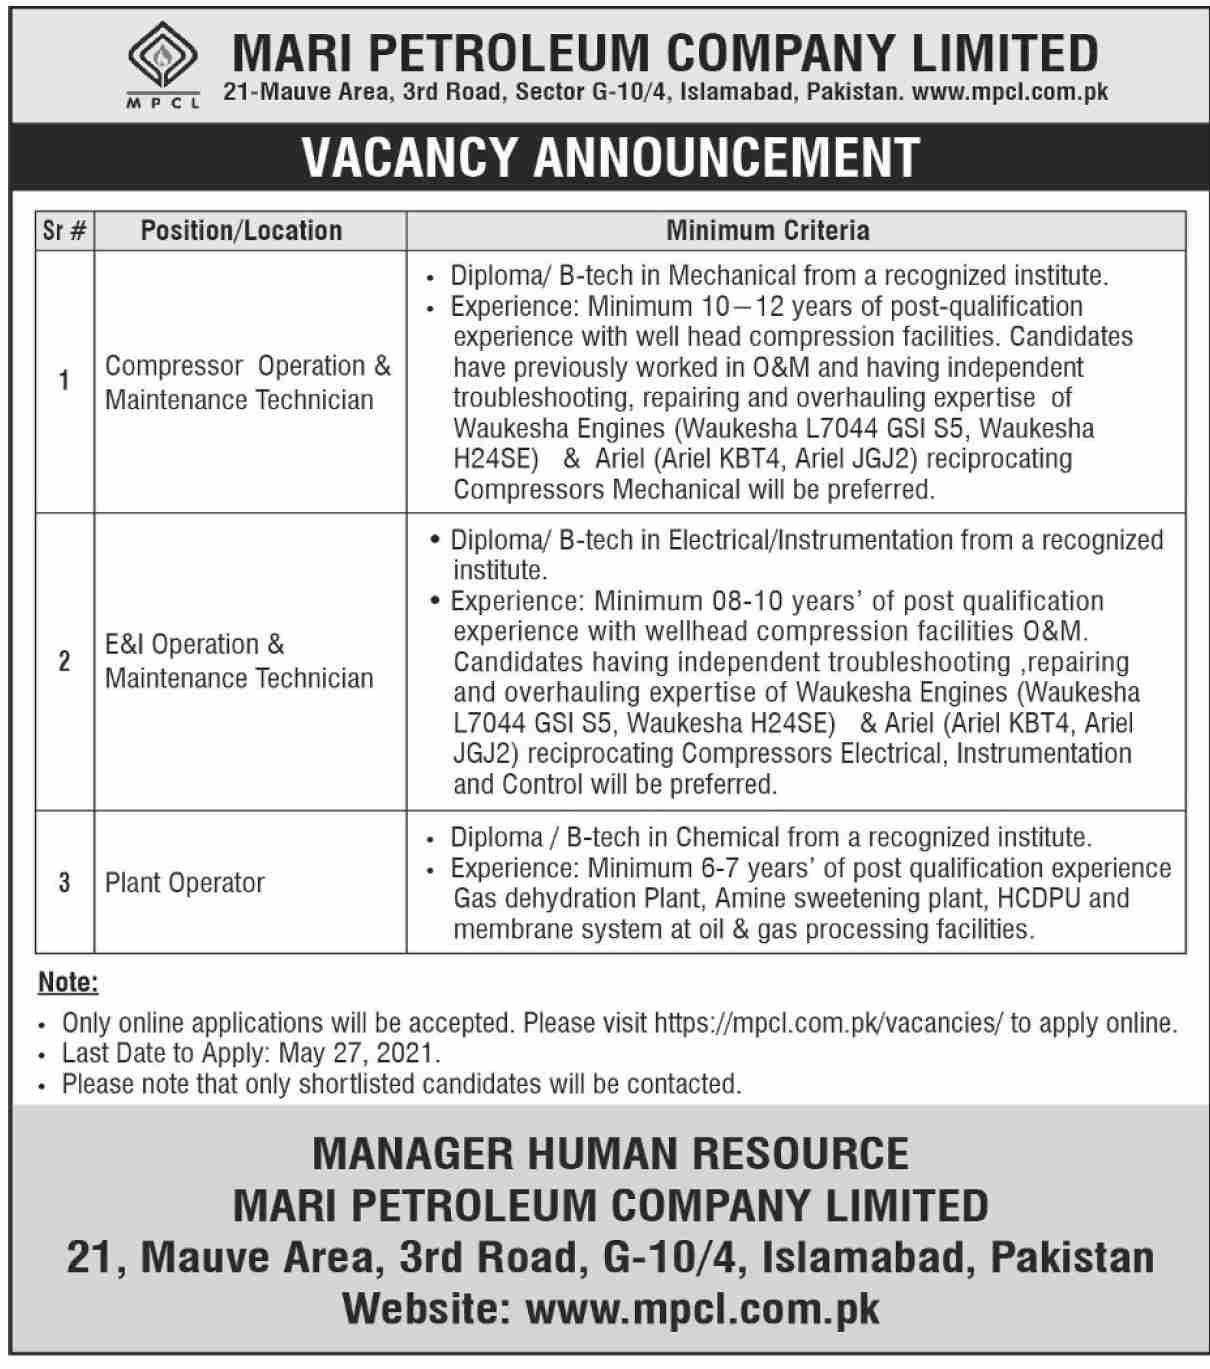 Mari Petroleum Company Limited (MPCL) Jobs 2021 in Pakistan